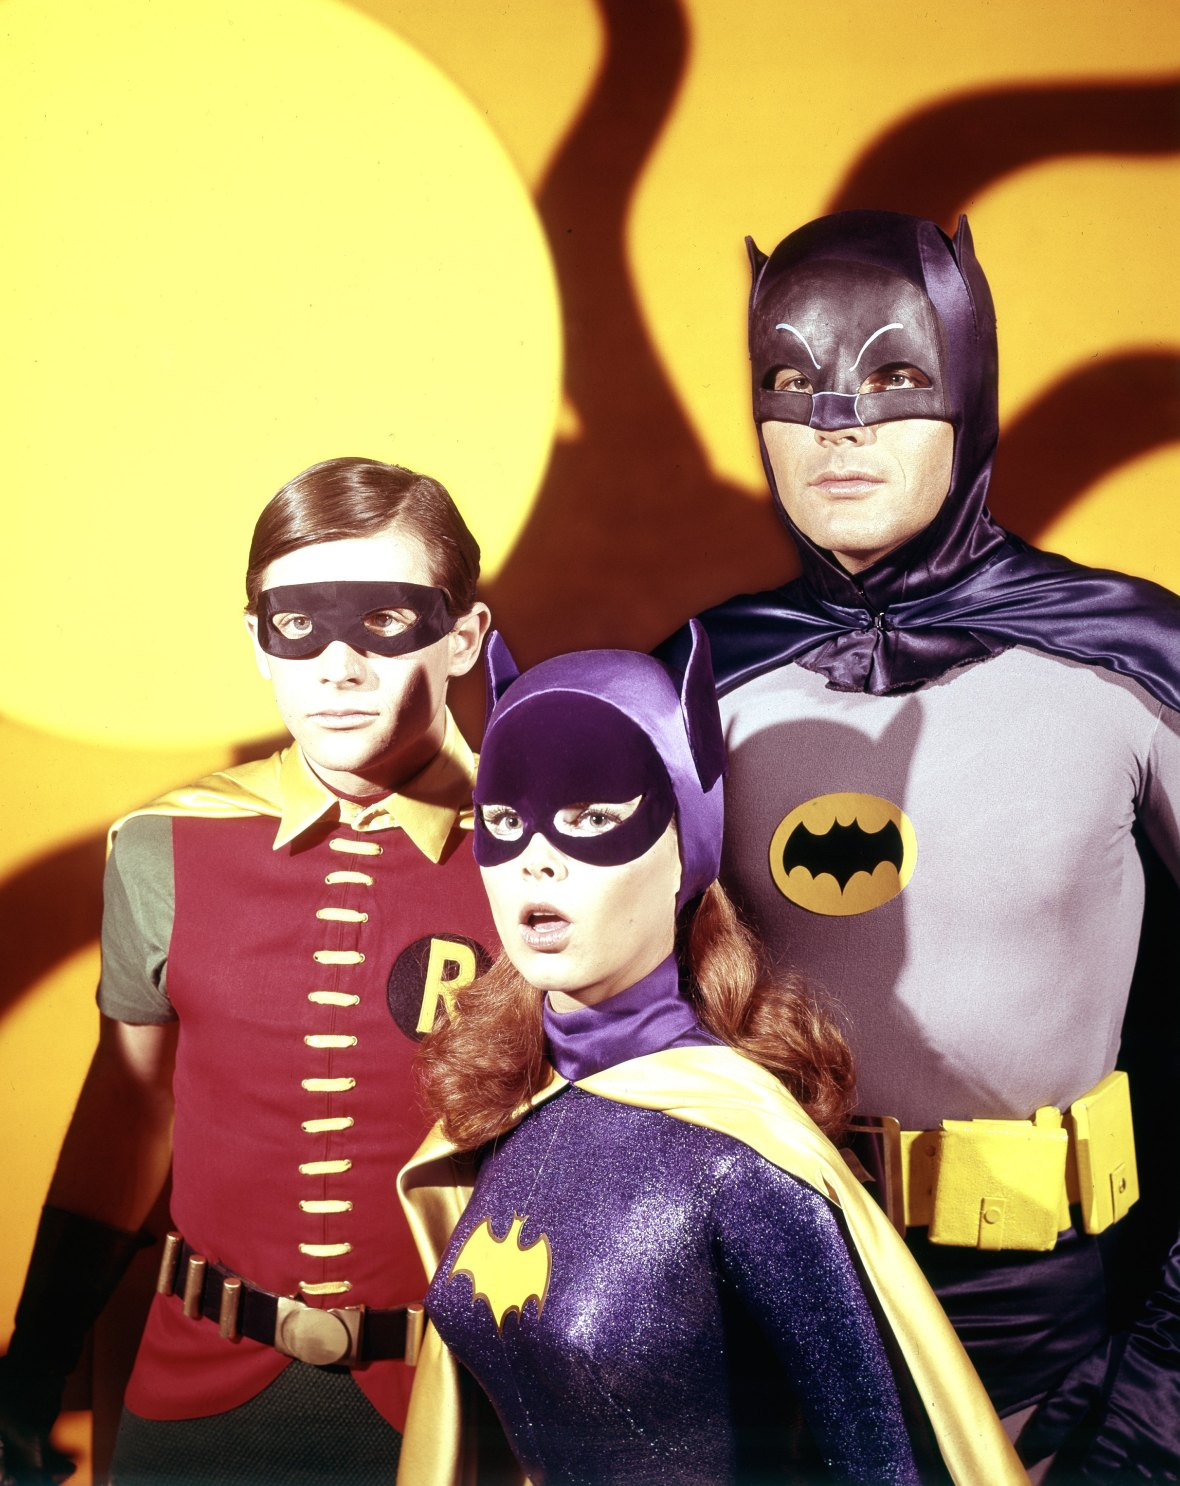 yvonne craig - batman and robin